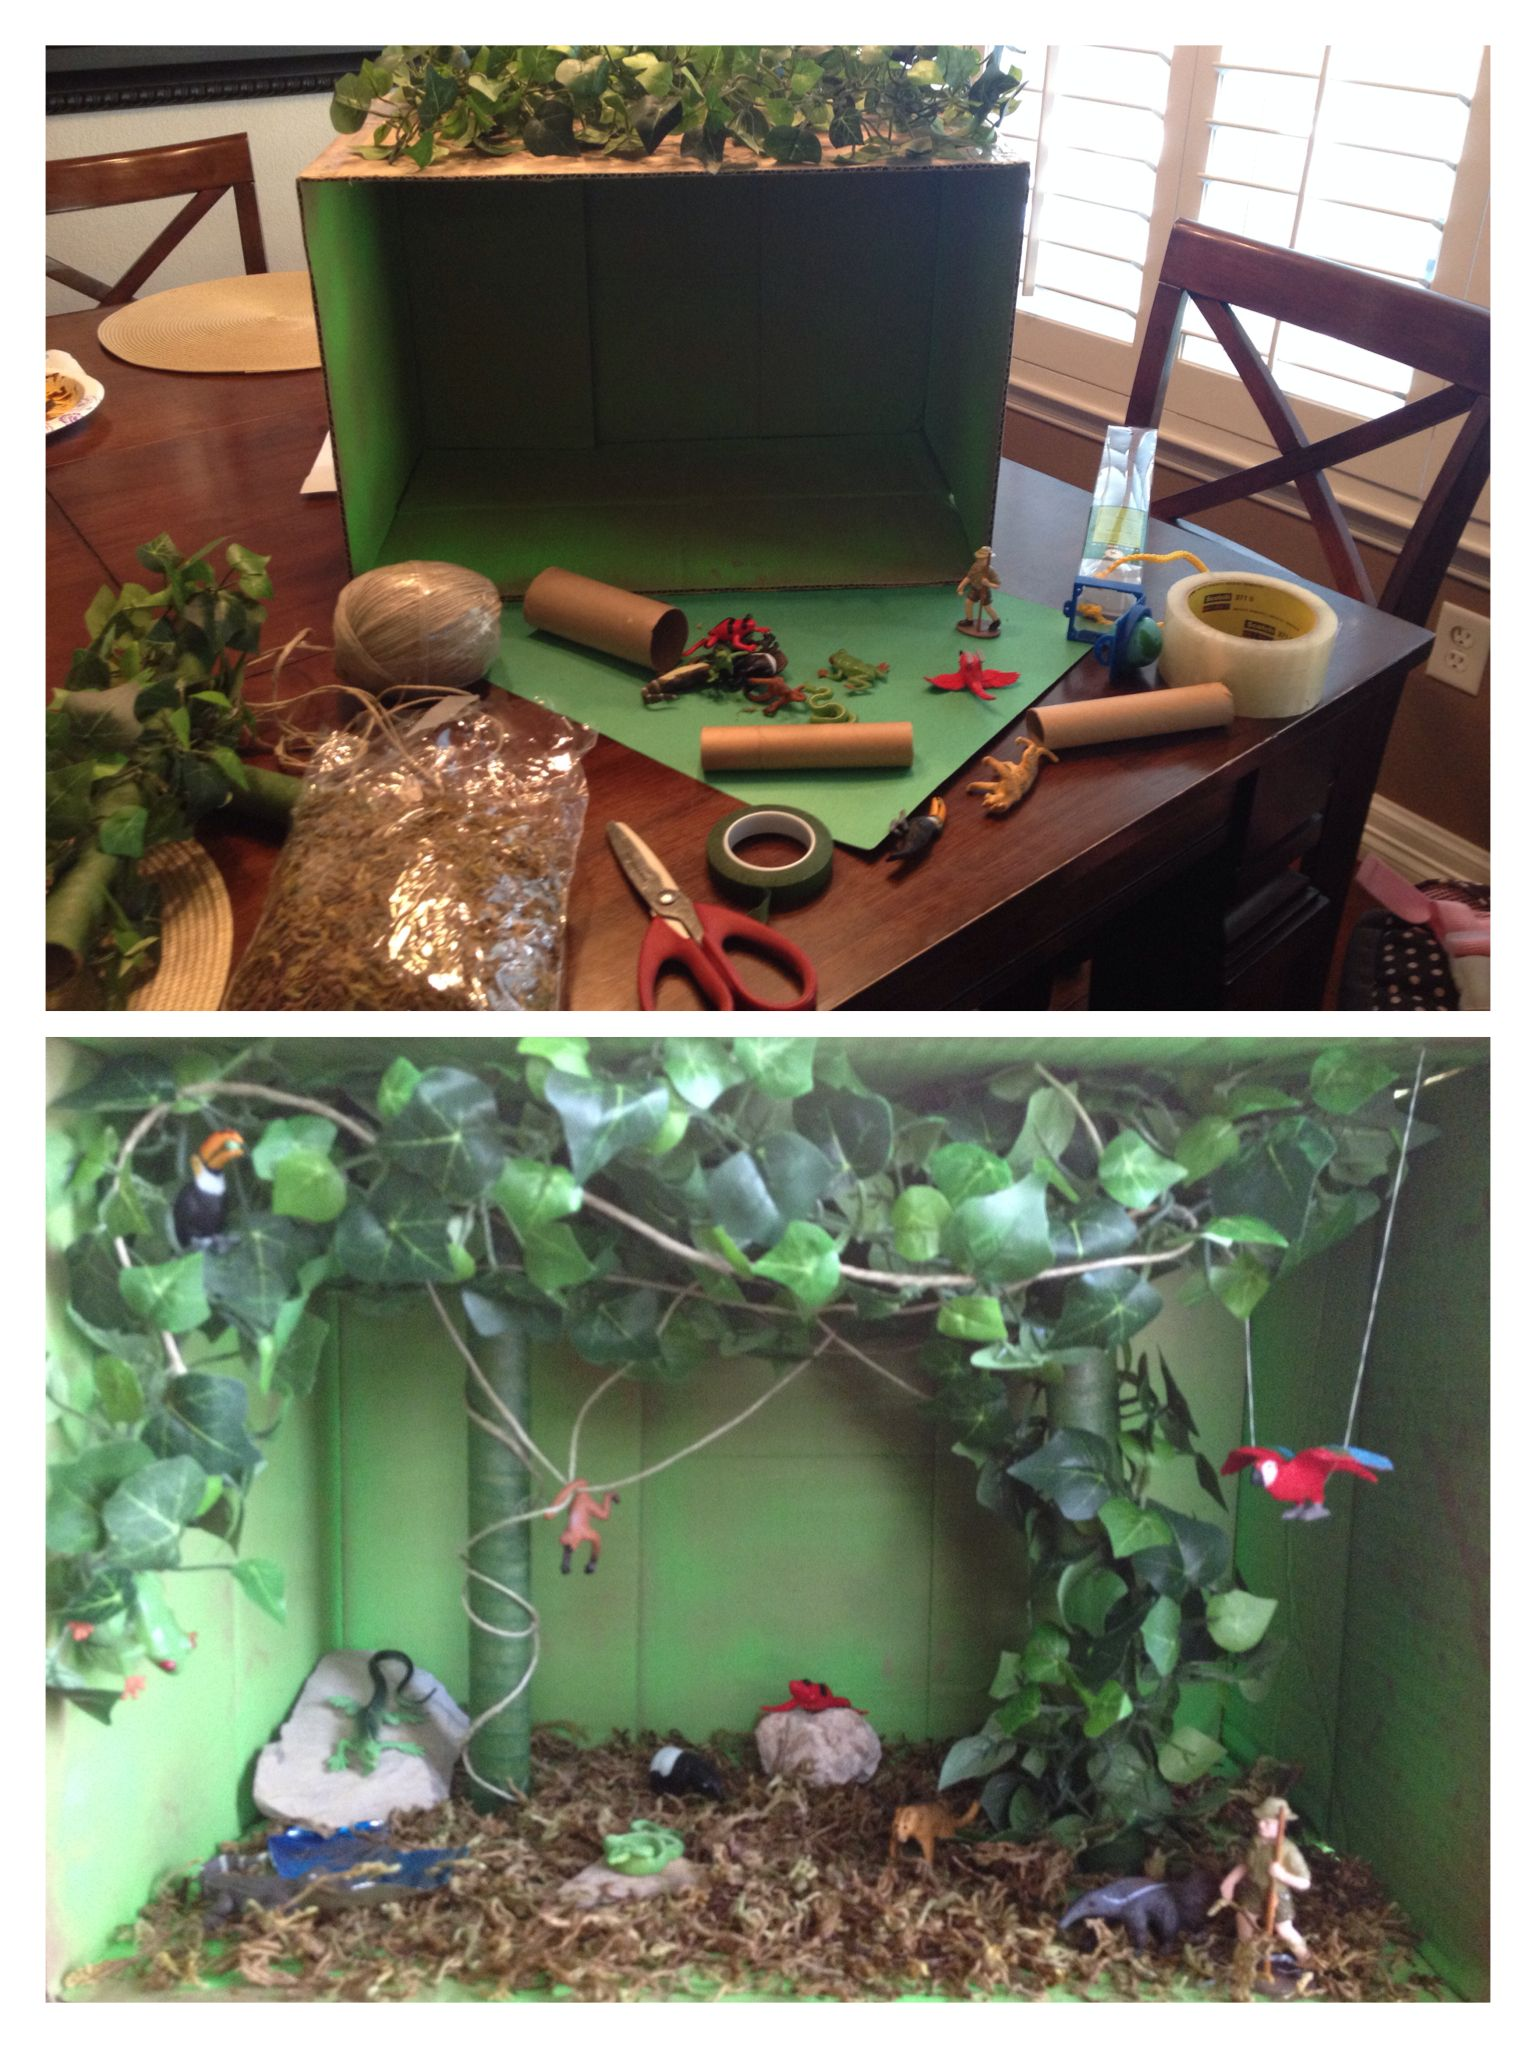 Rainforest Craft Ideas For Kids Part - 25: Rainforest Diorama · Rainforest EcosystemRainforest ThemeRainforest ProjectRainforest  CraftsScience ProjectsSchool ProjectsKid ...